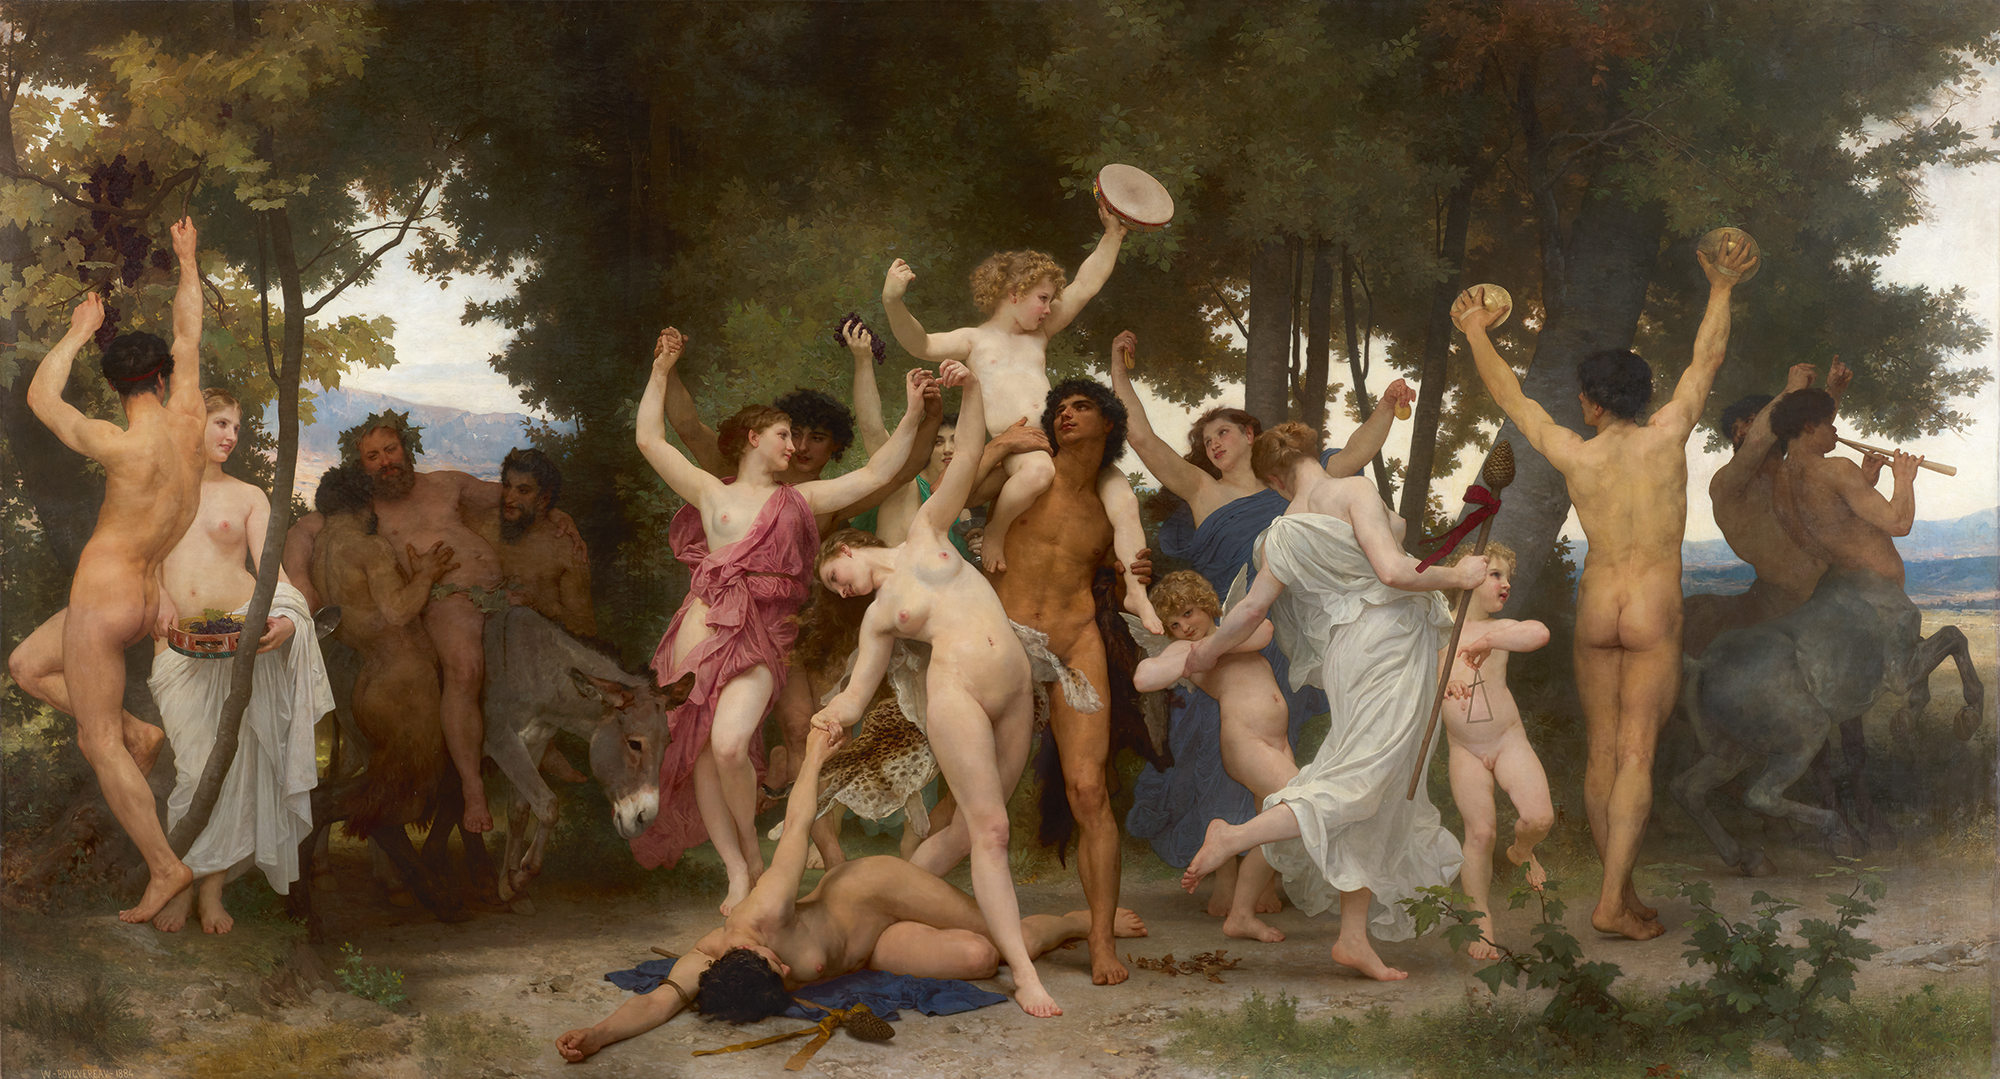 La Jeunesse de Bacchus, William Bouguereau. Olja på duk, 1884. Bild: Sotheby's